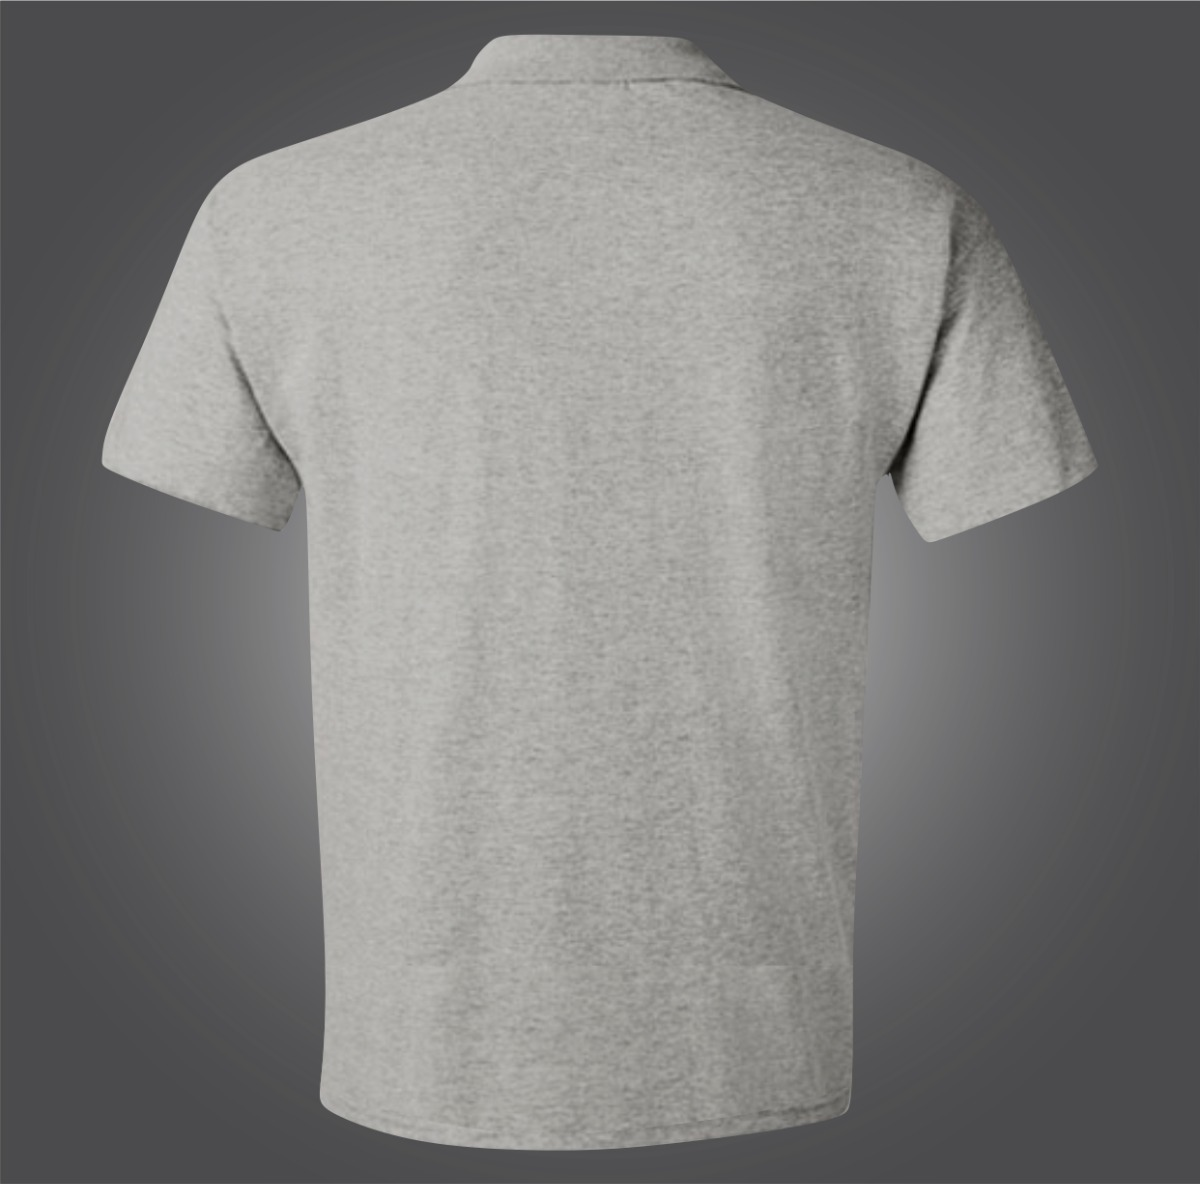 Camisa Polo Camiseta Polo Lisa Blusa Gola Polo - R  44 20c1149d1e00b